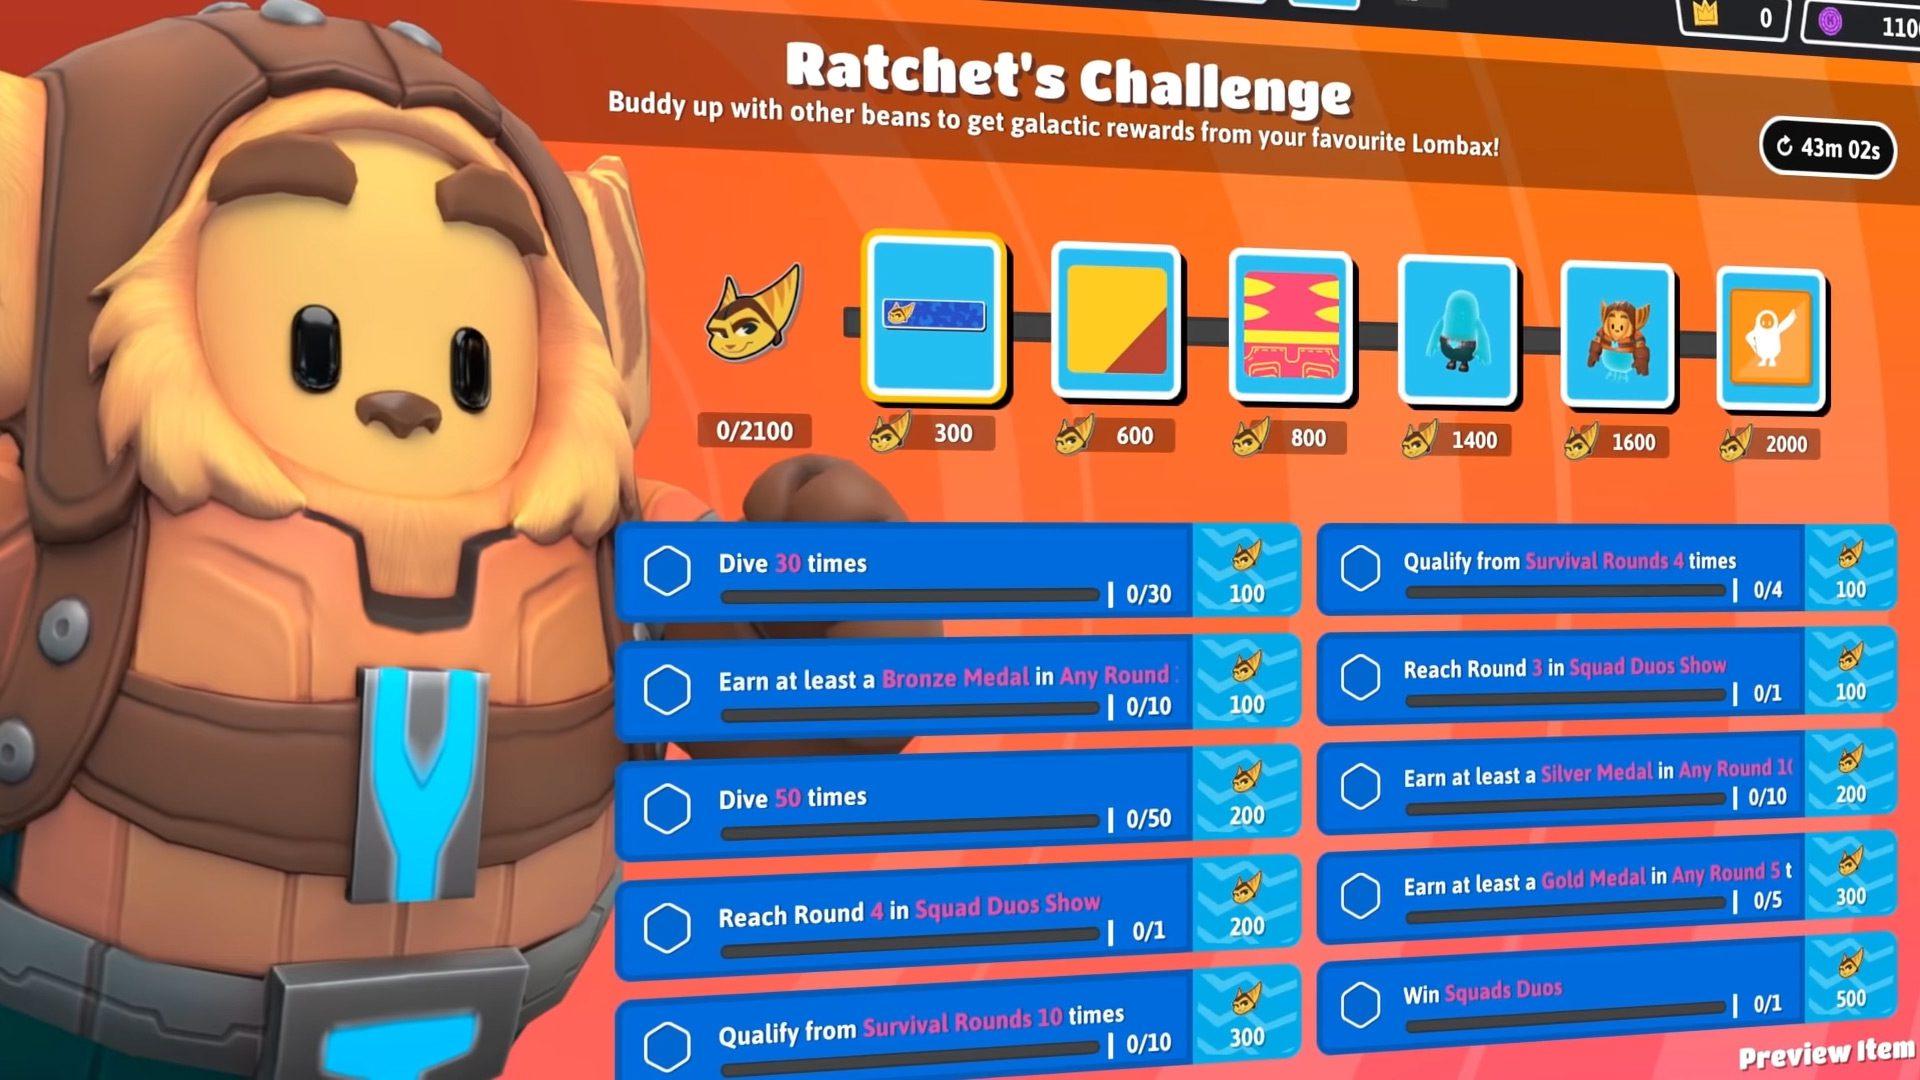 Ratchet's Challenge goals in Fall Guys Season 5